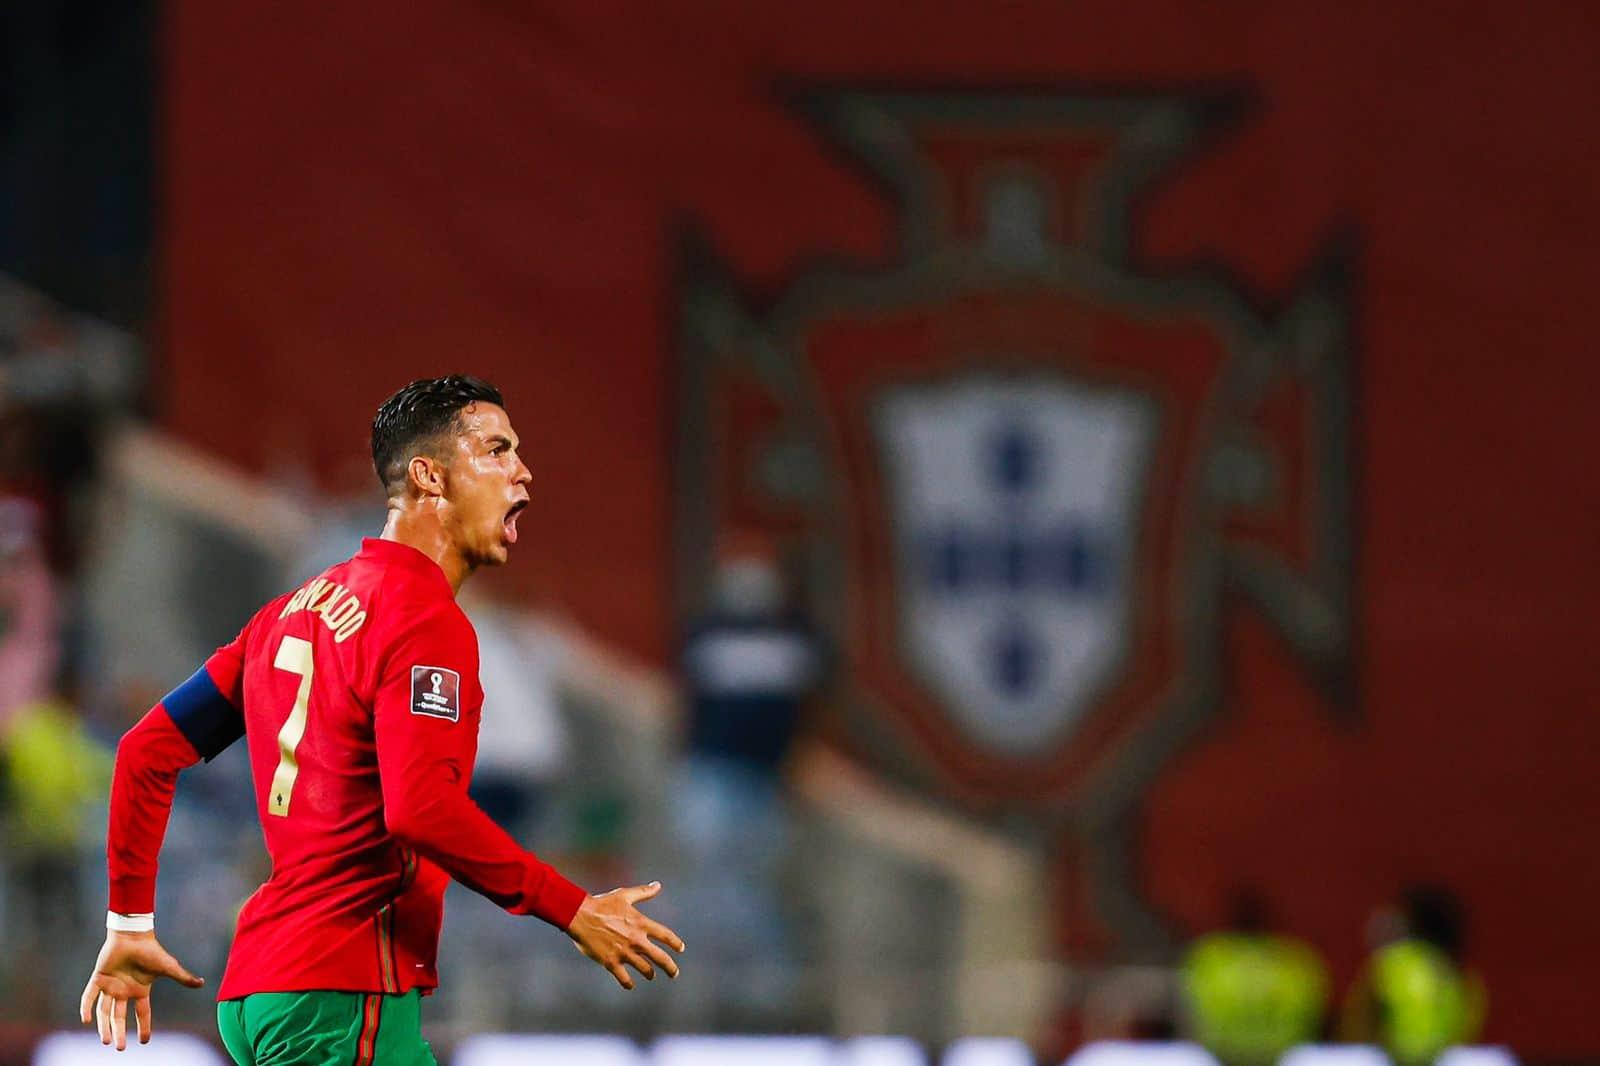 Cristiano Ronaldo manda emotivo mensaje tras su récord con Portugal